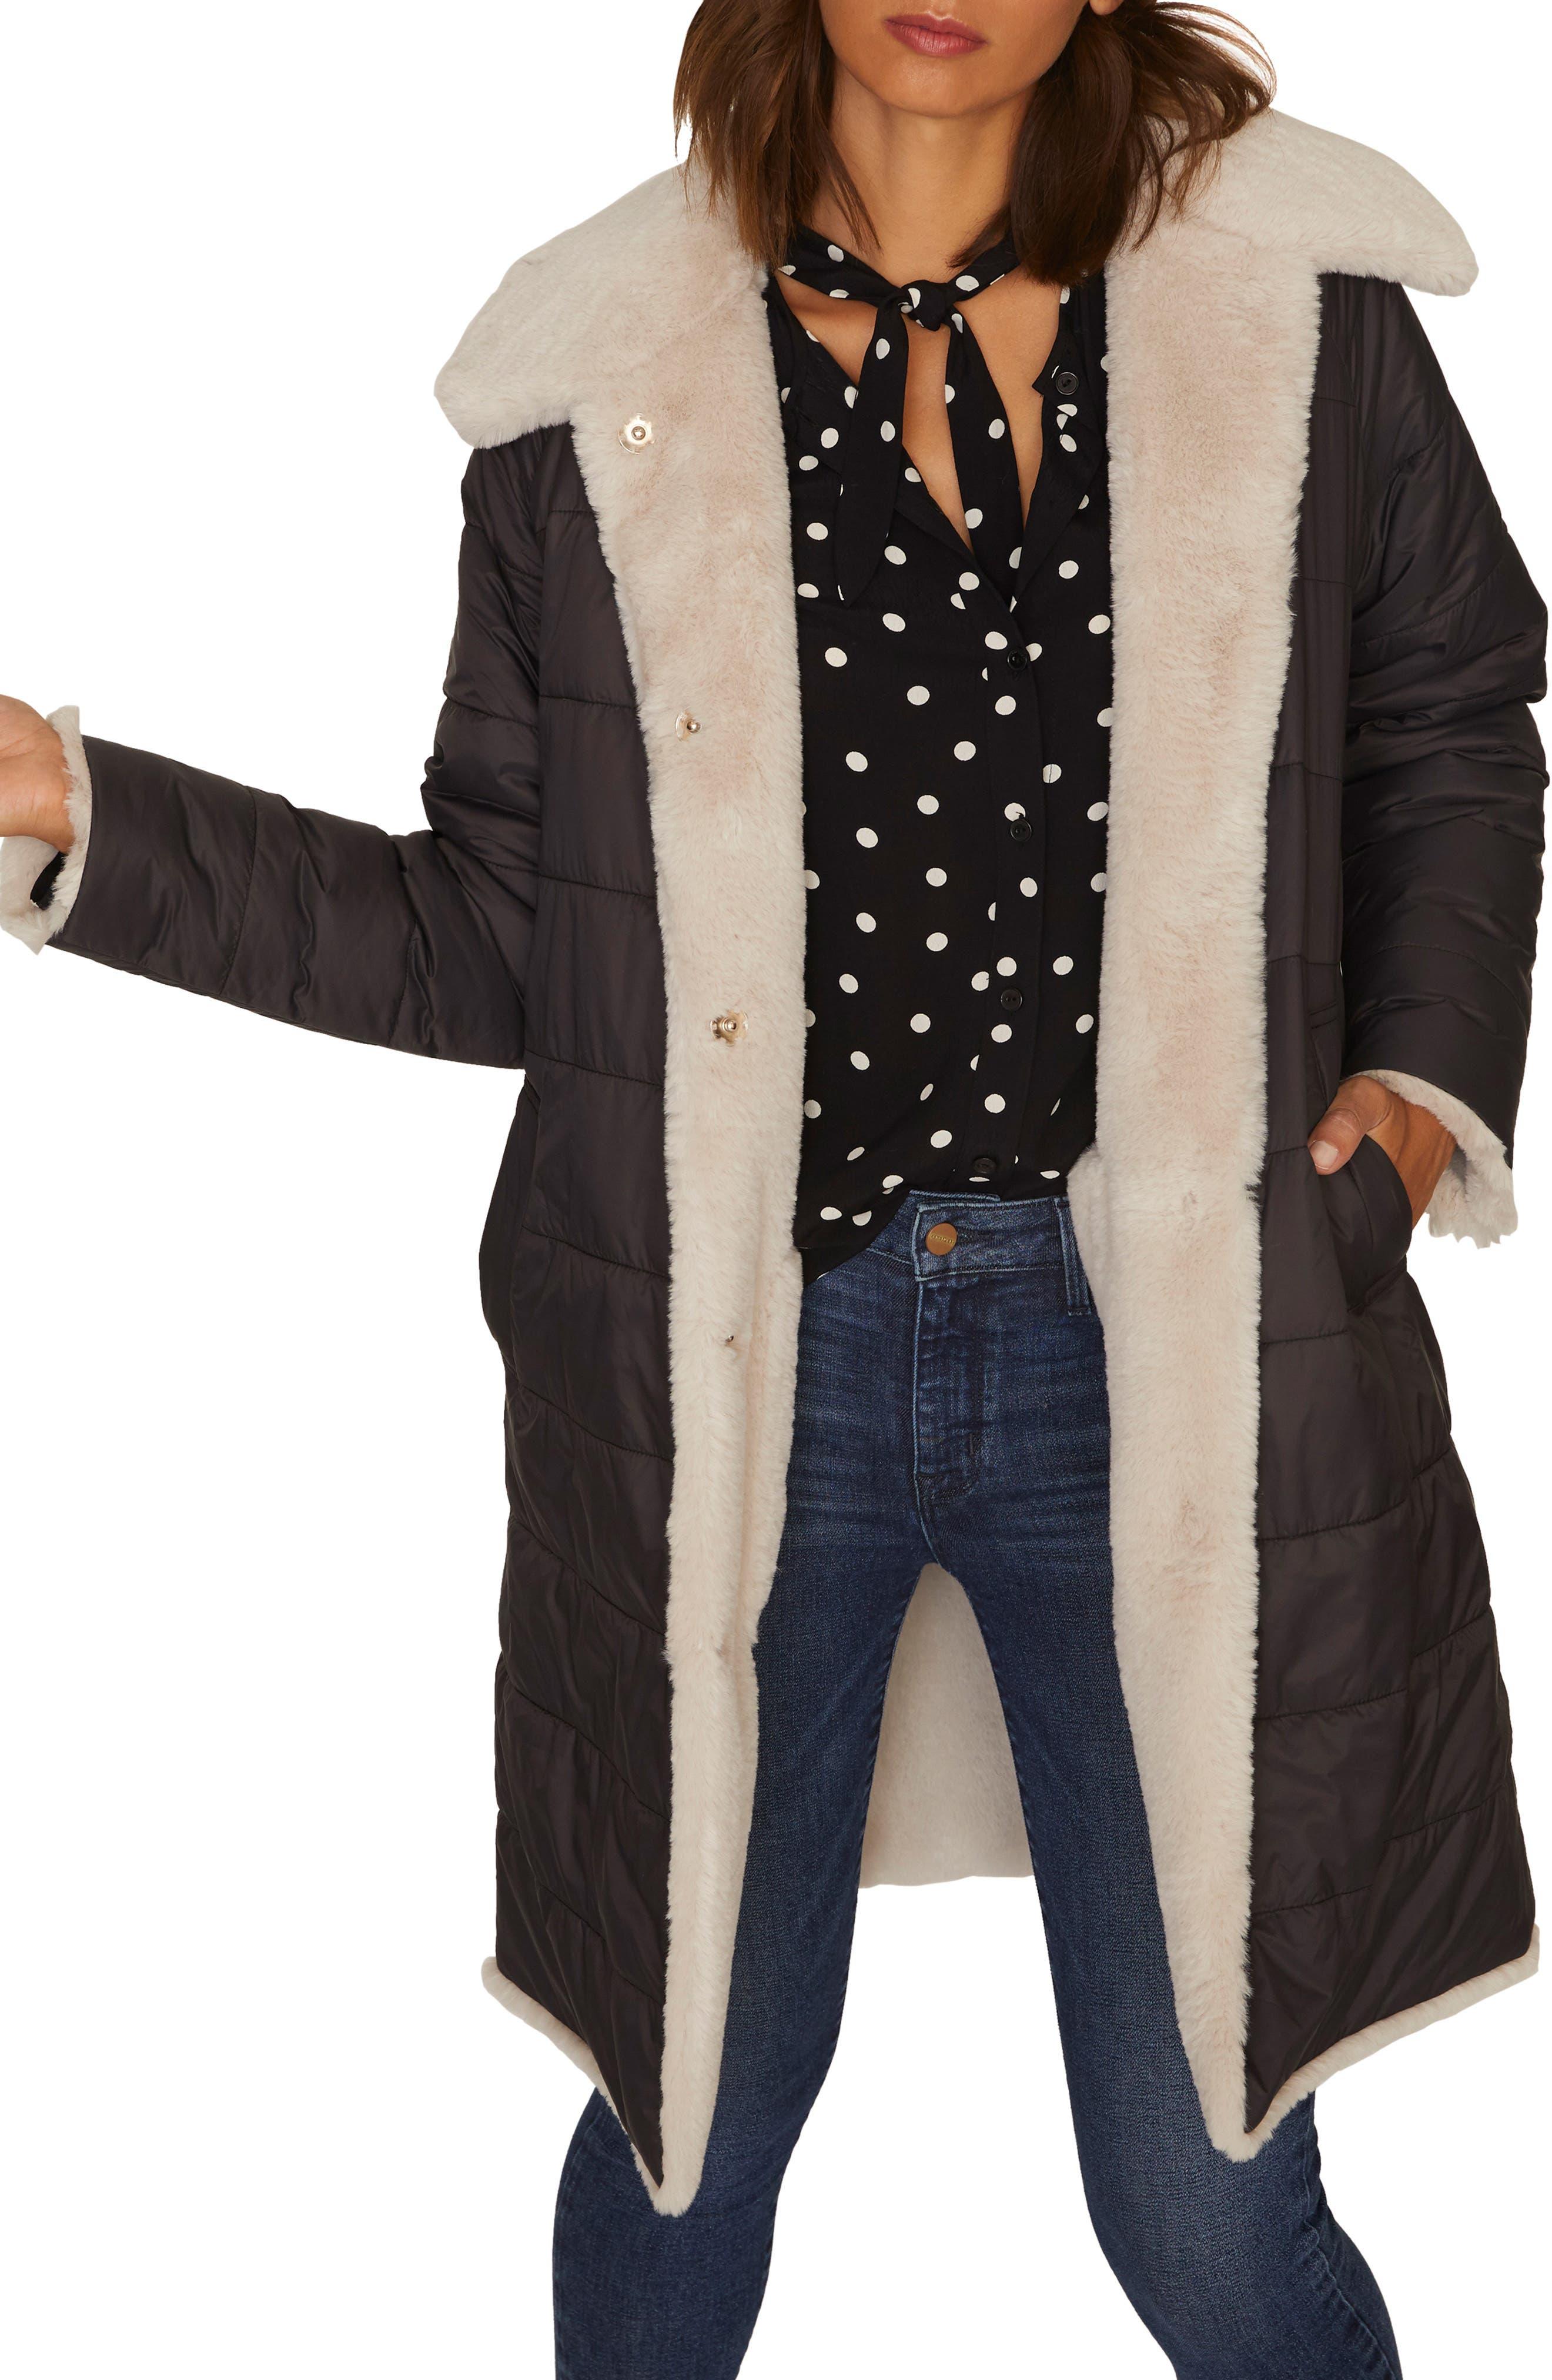 2 Be Real Reversible Puffa Faux Shearling Coat,                         Main,                         color, 001